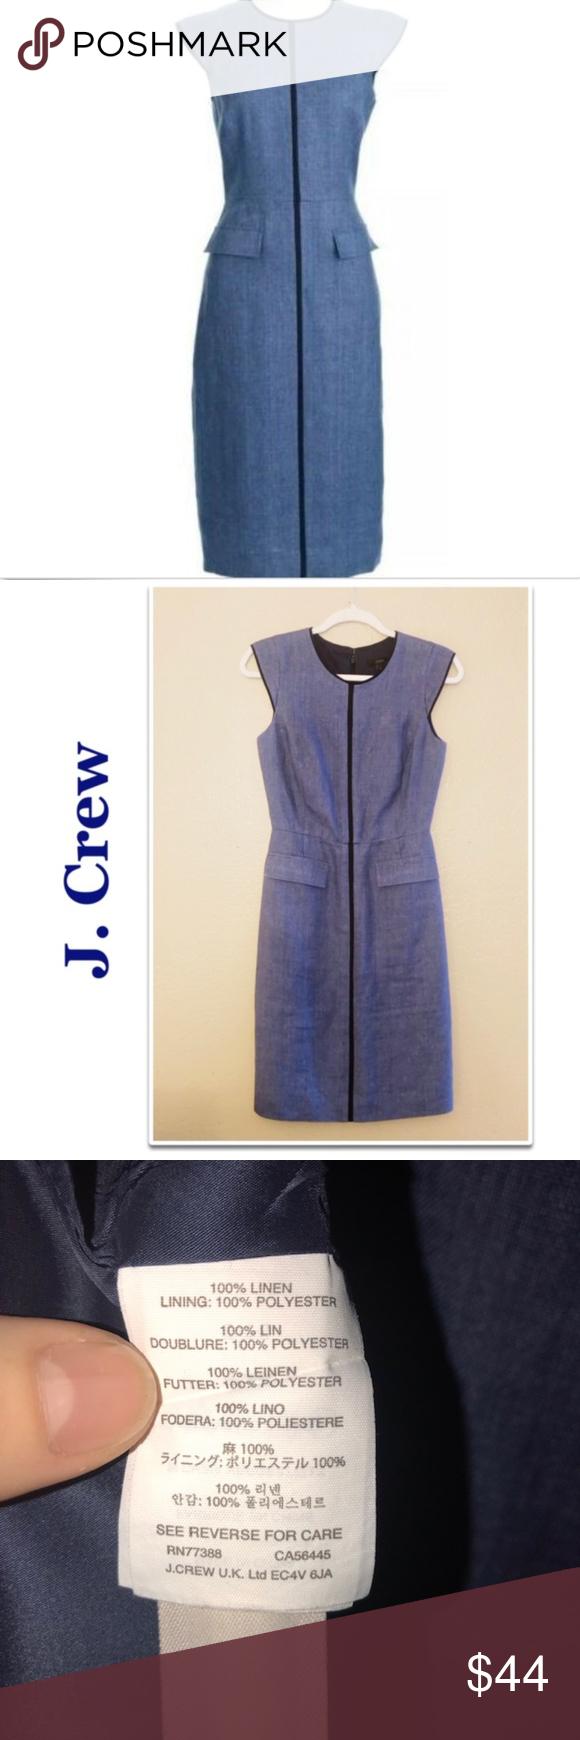 1d16a3a4ac J. Crew Blue Linen Patch-pocket Cap Sleeve Sheath Blue linen cap sleeve J